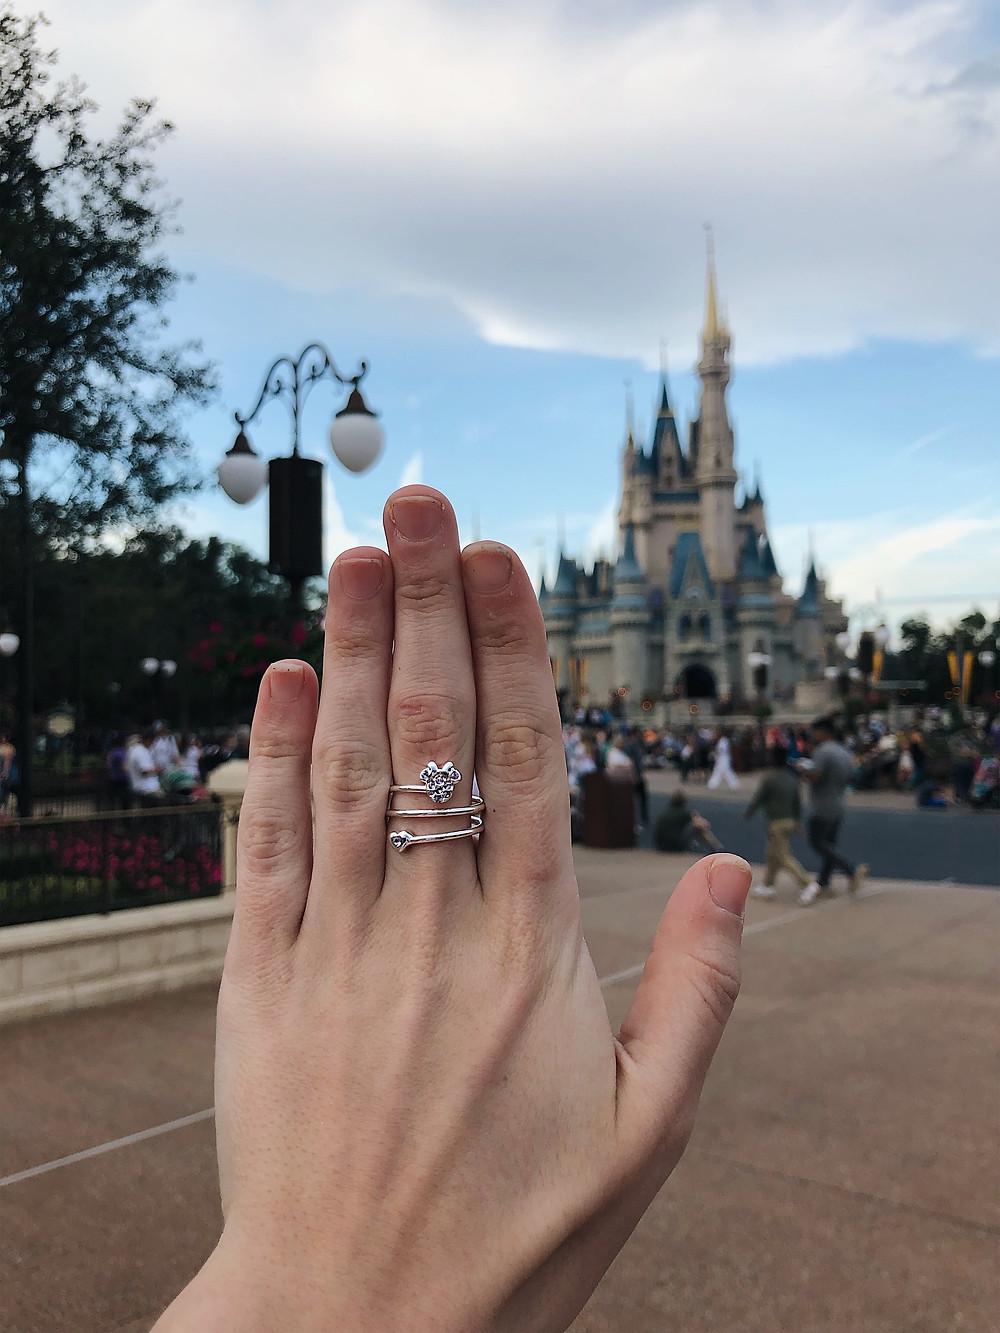 June Birthstone ring, disney castle, disney ring